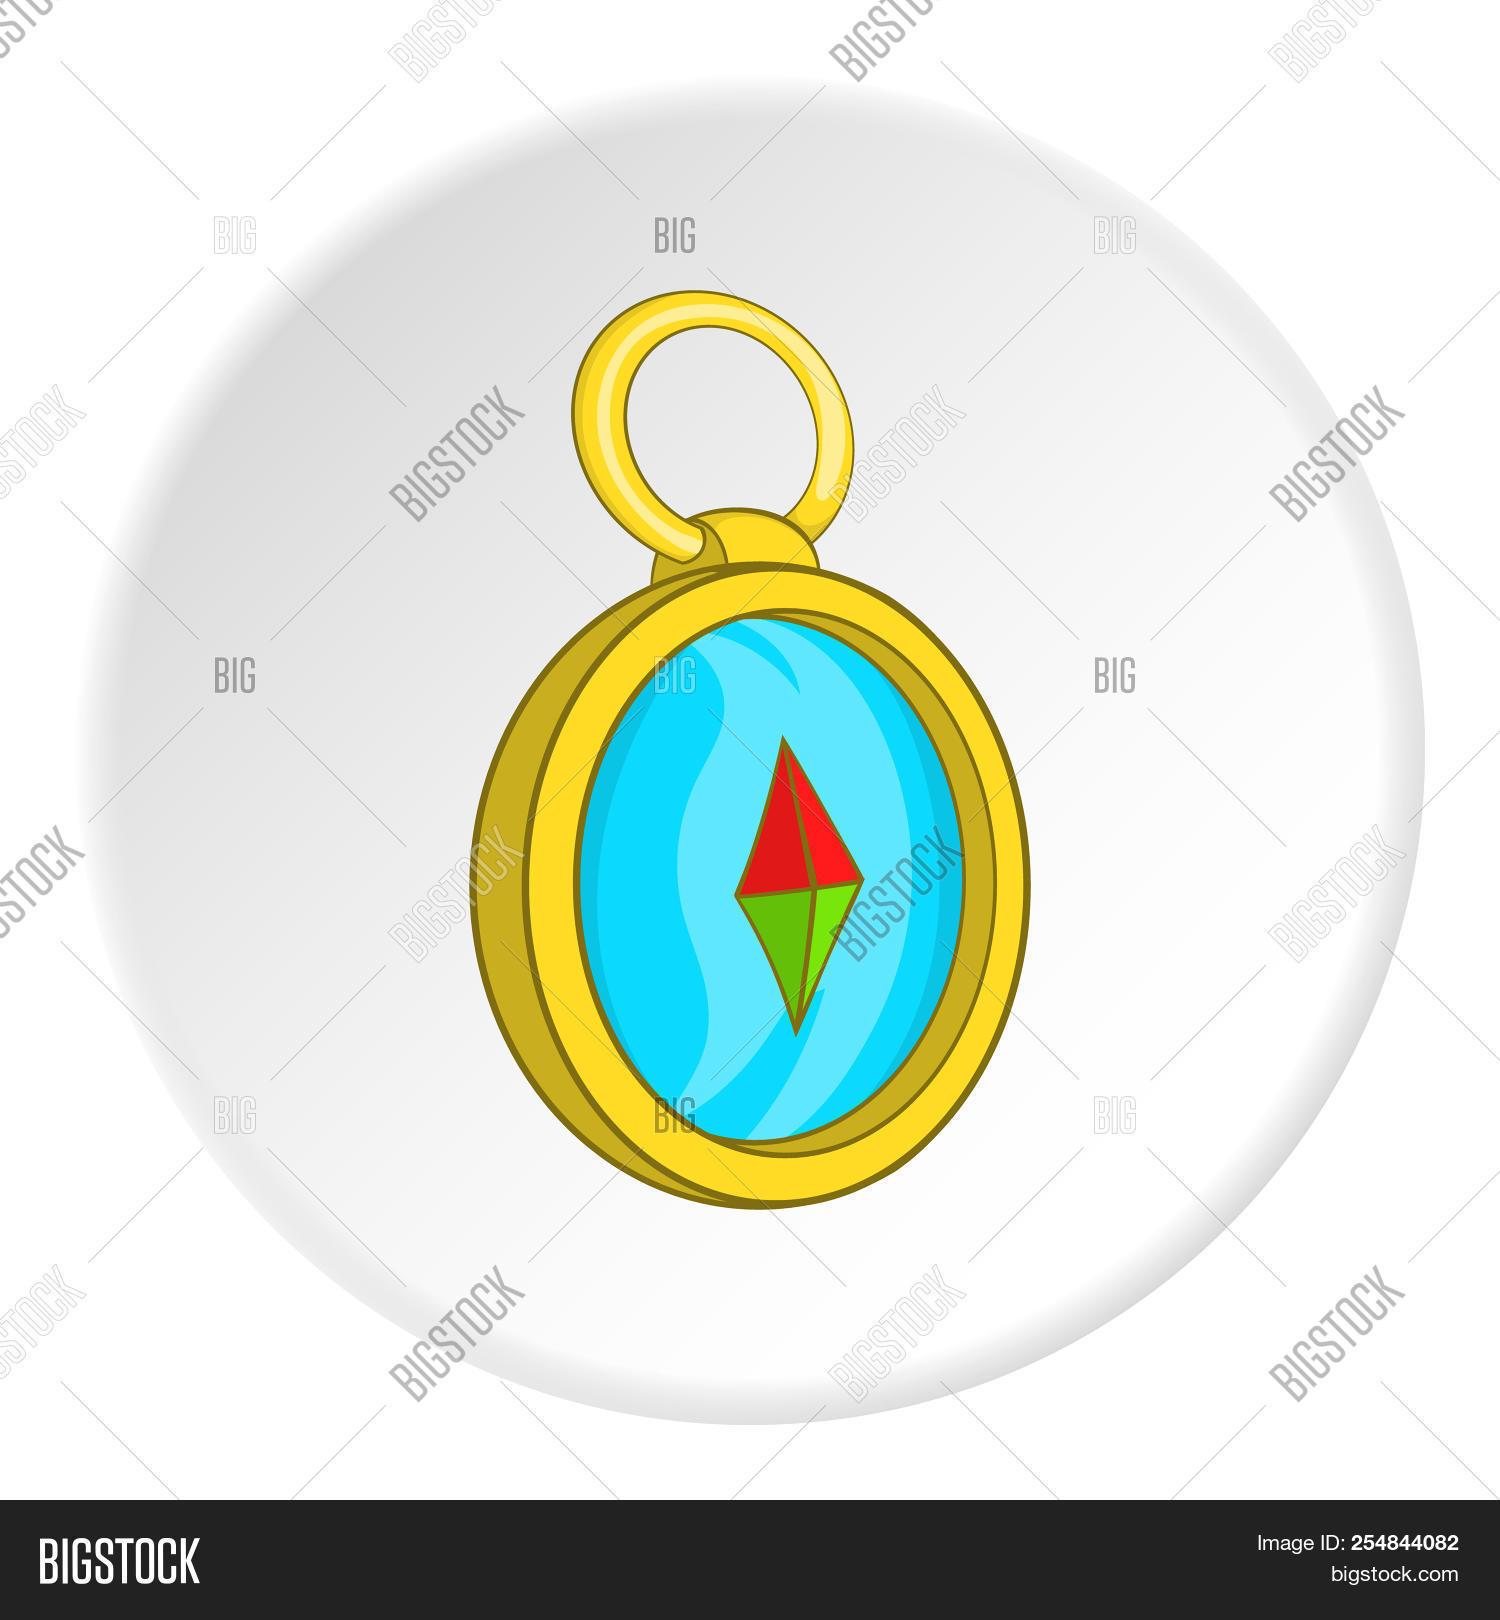 Compass Icon Cartoon Image Photo Free Trial Bigstock